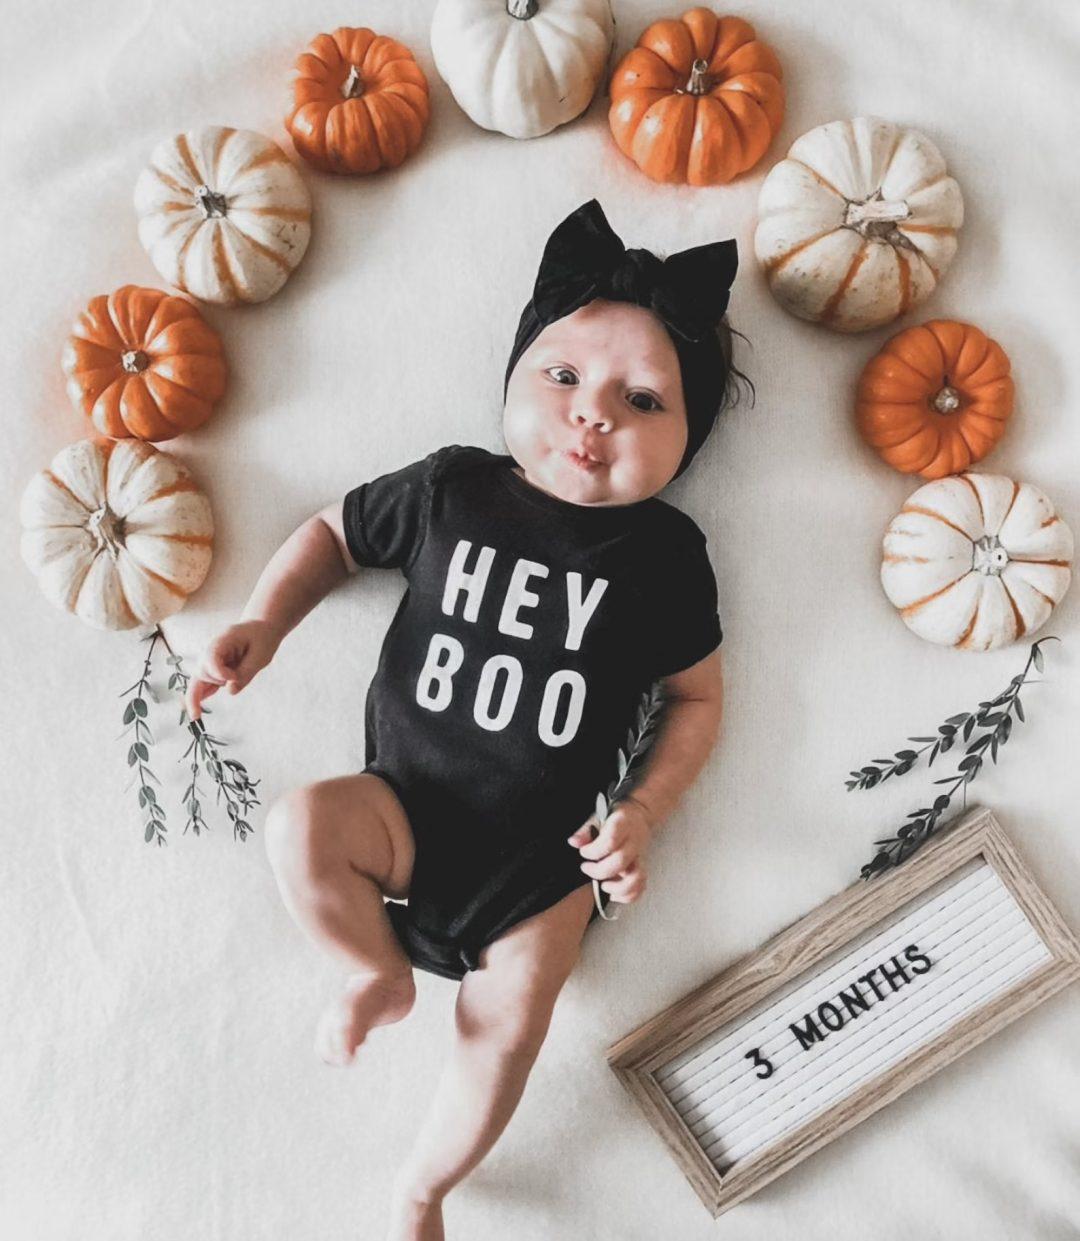 Best Newborn Halloween Costumes: Hey Boo black onesie